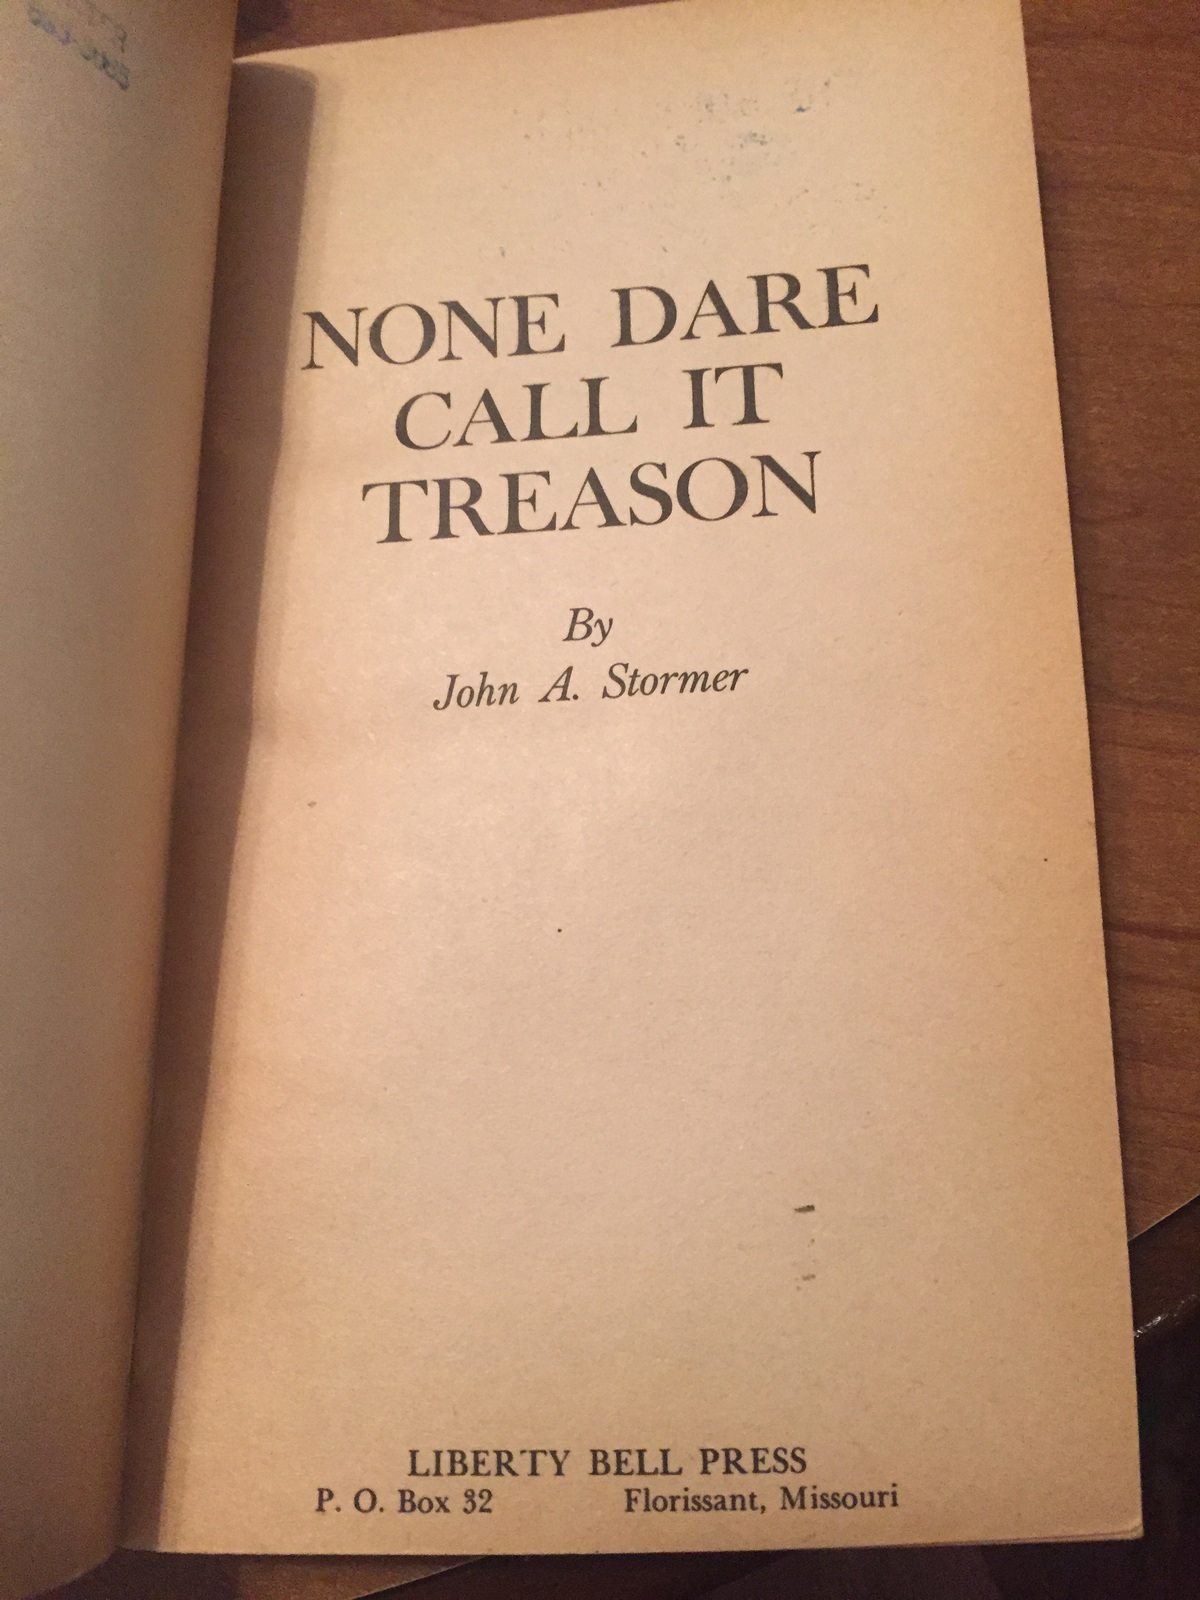 None Dare Call it Treason by John A. Stormer jvc146